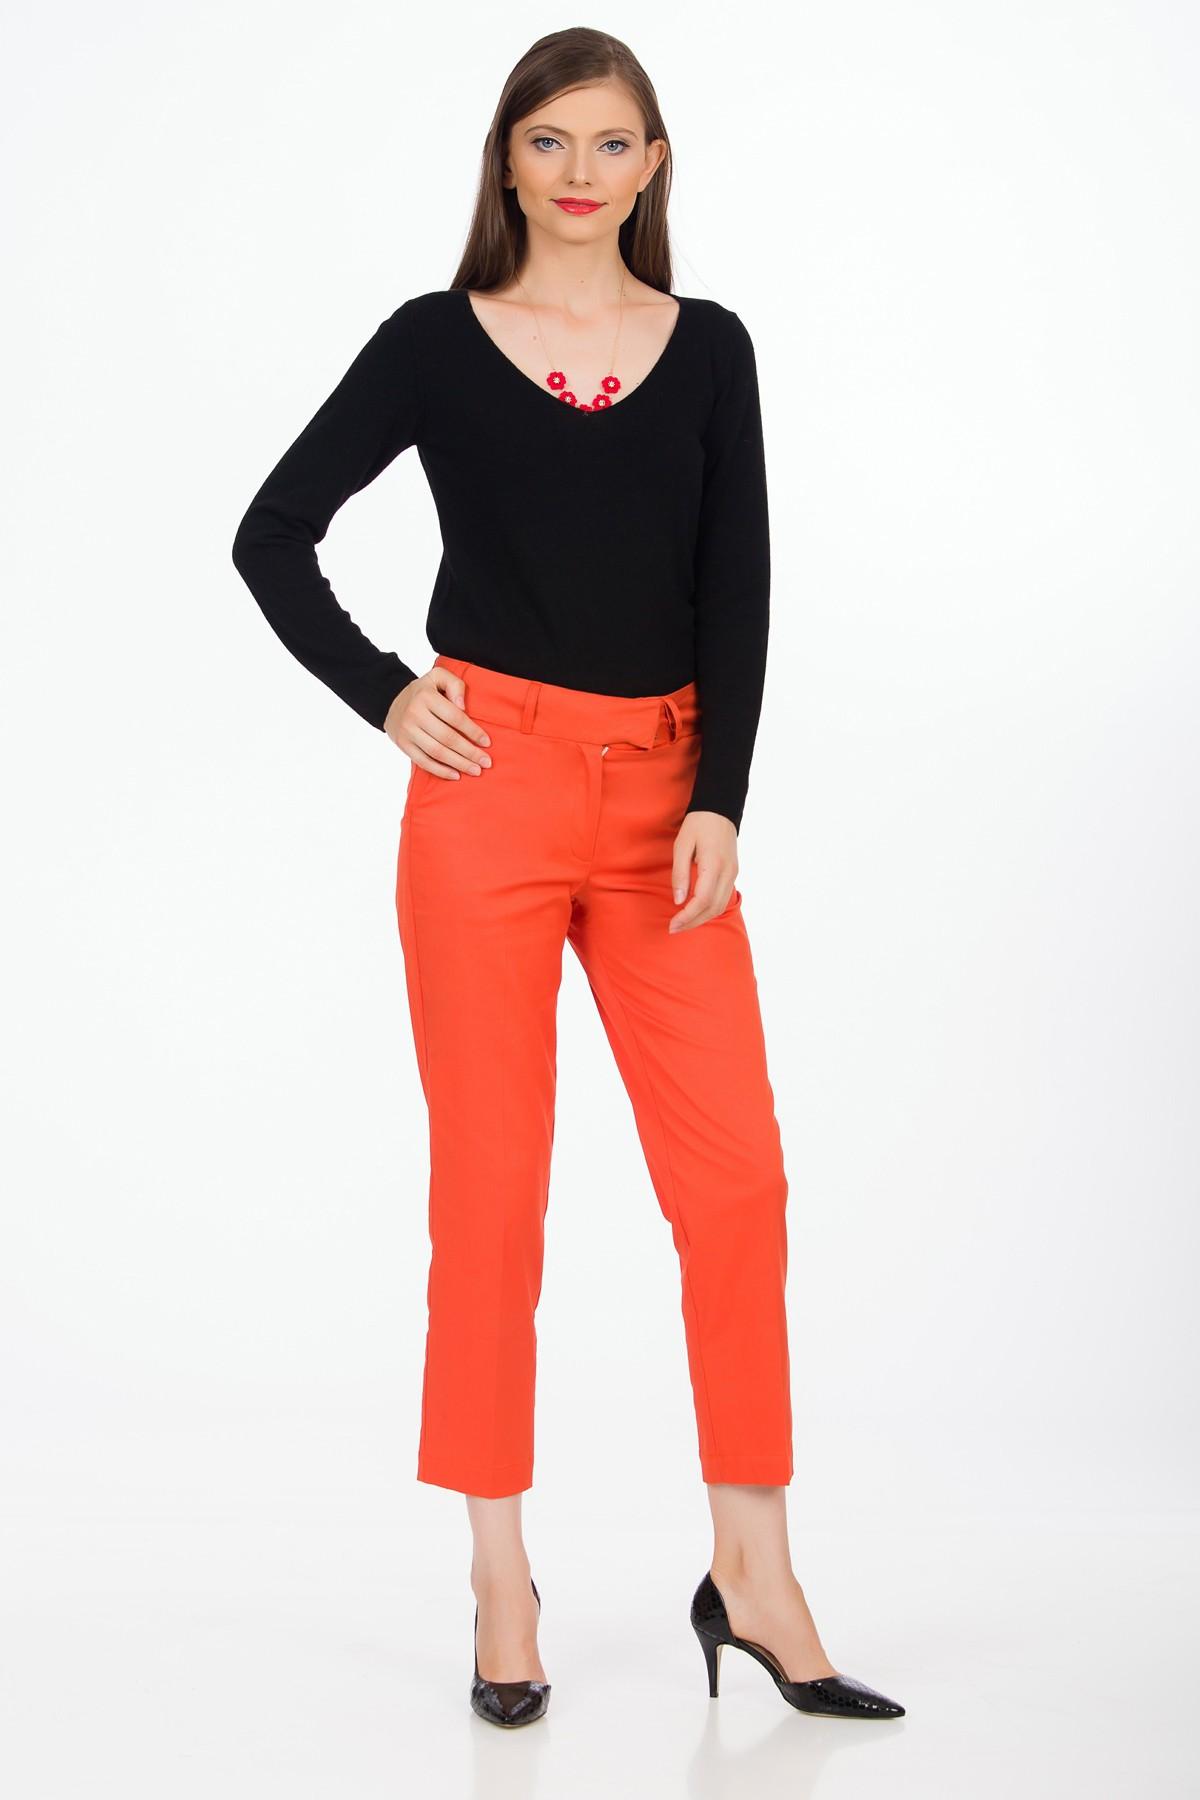 pantaloni-oranj-sense